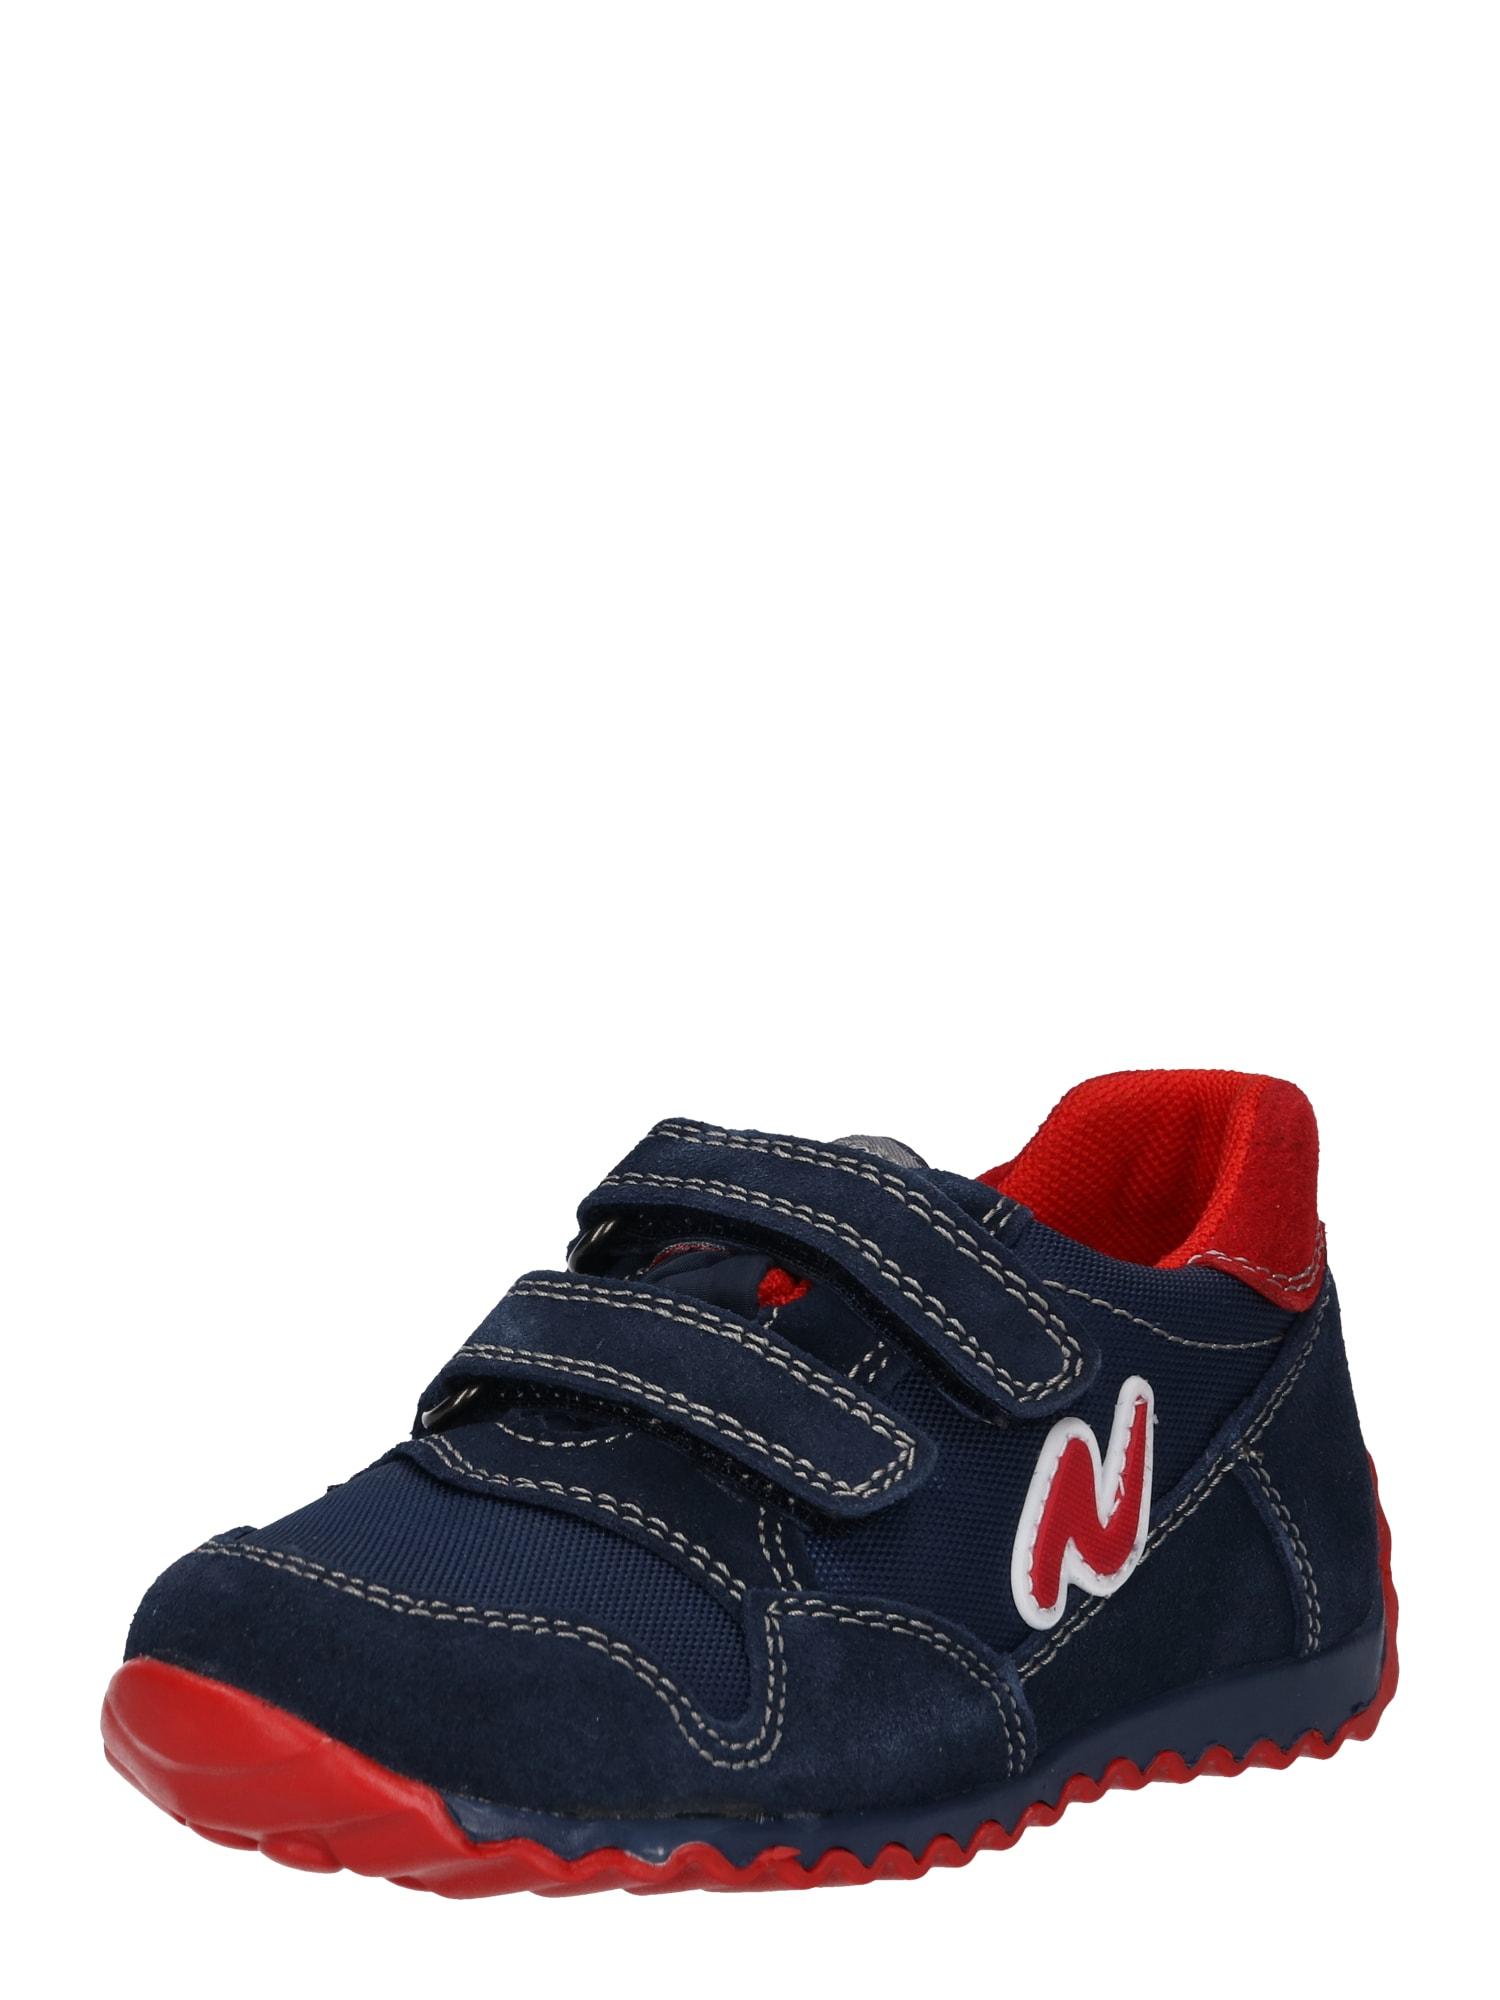 Polobotky Jackson námořnická modř červená NATURINO